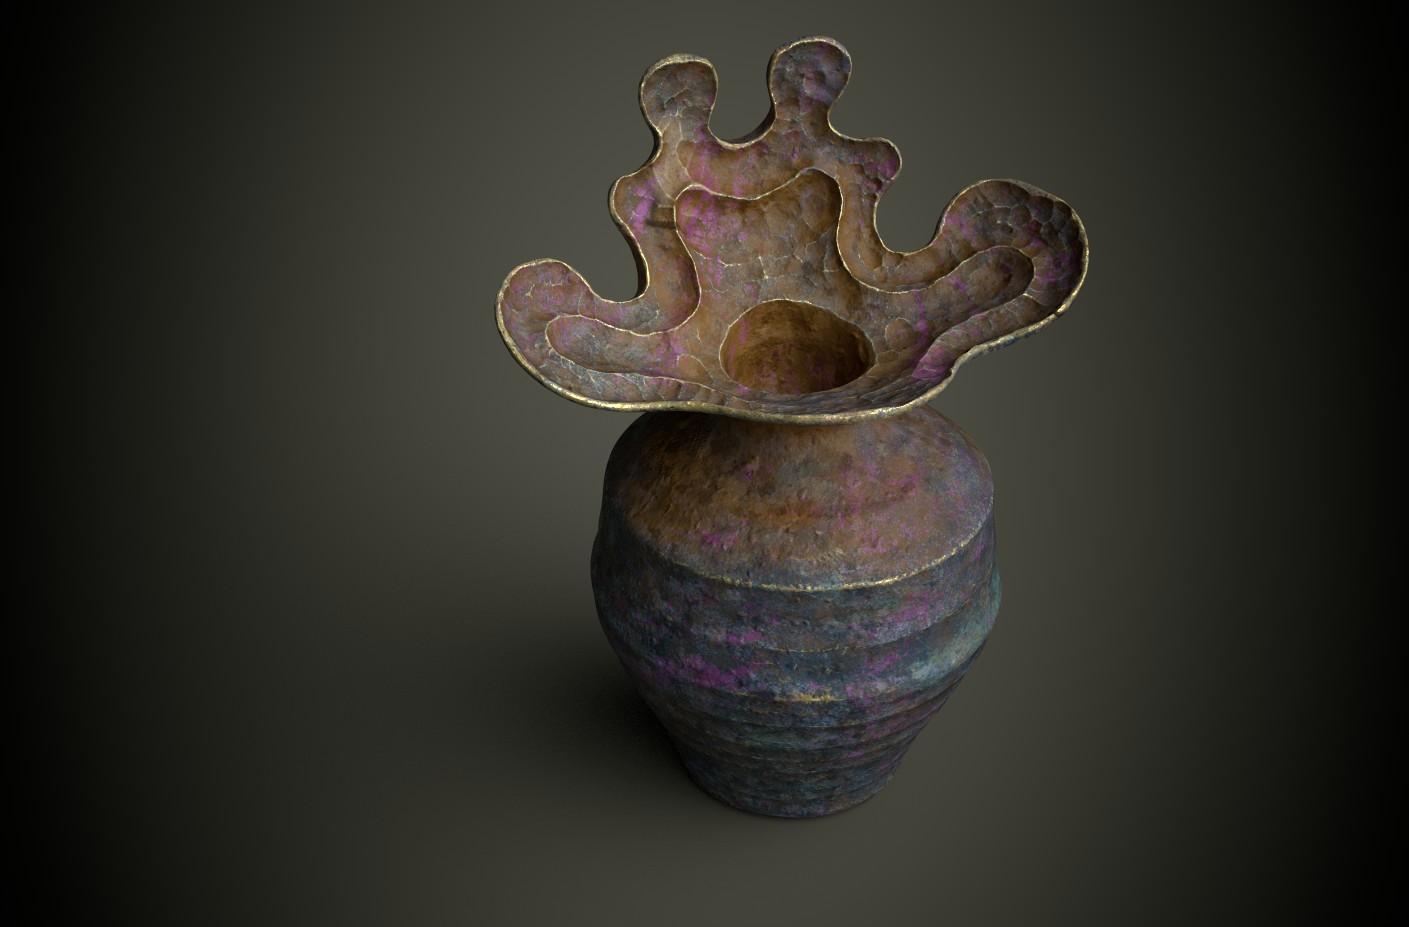 PAINTER vase organique 2 render test 3